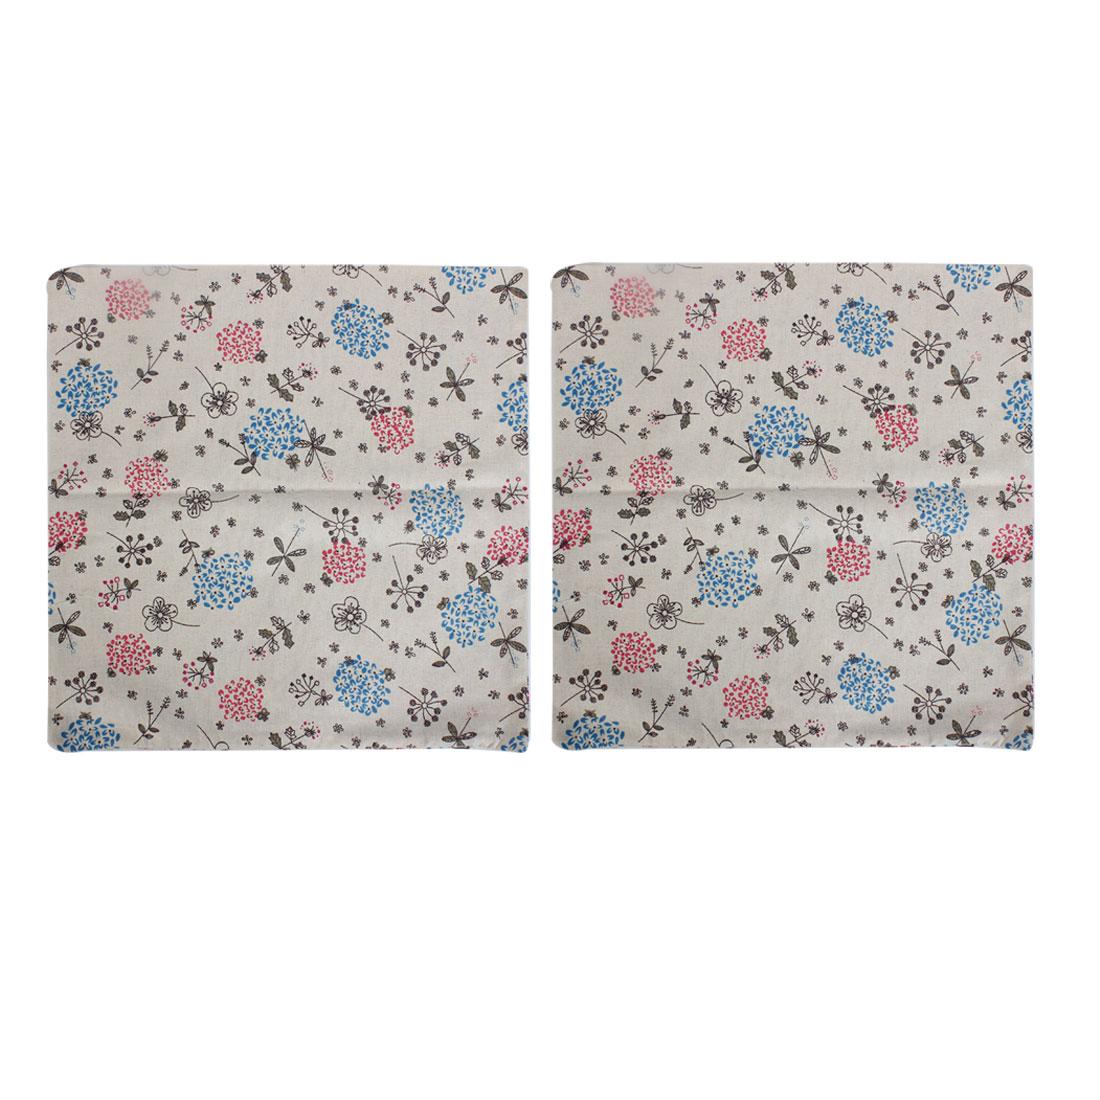 Floral Printed Cushion Cover Pillow Case 45 x 45cm 2pcs